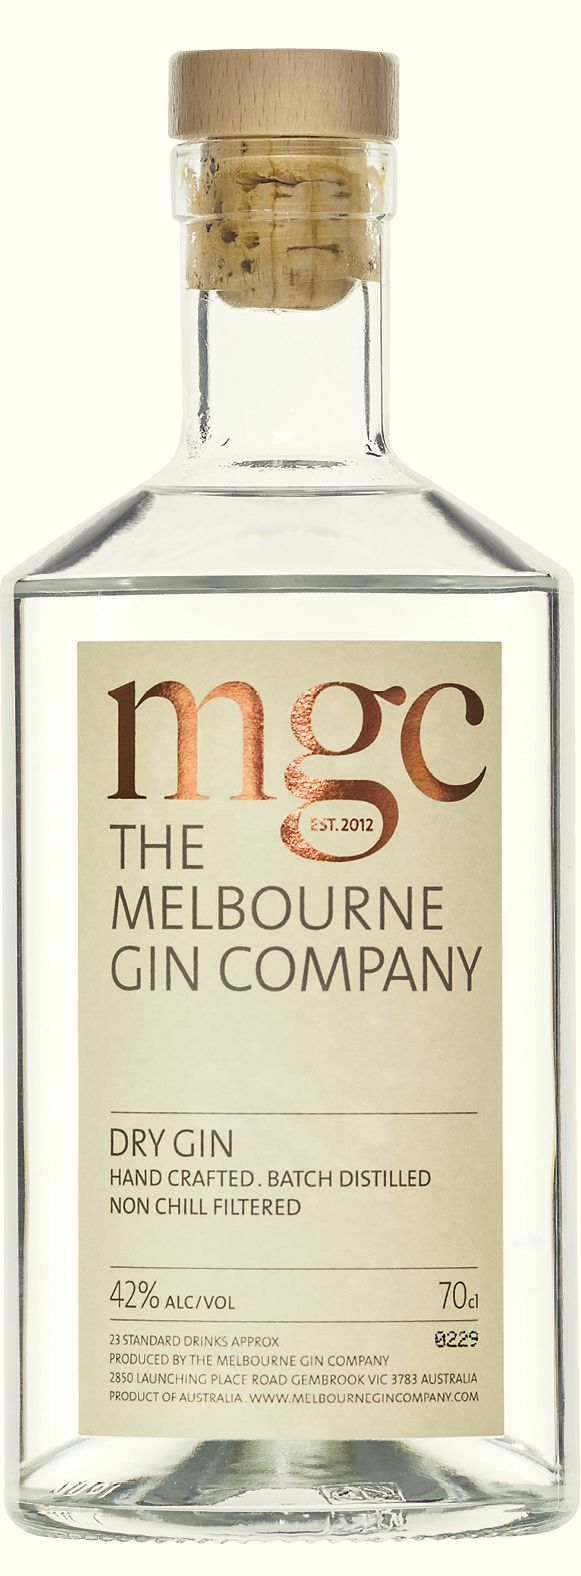 THE MELBOURNE GIN COMPANY